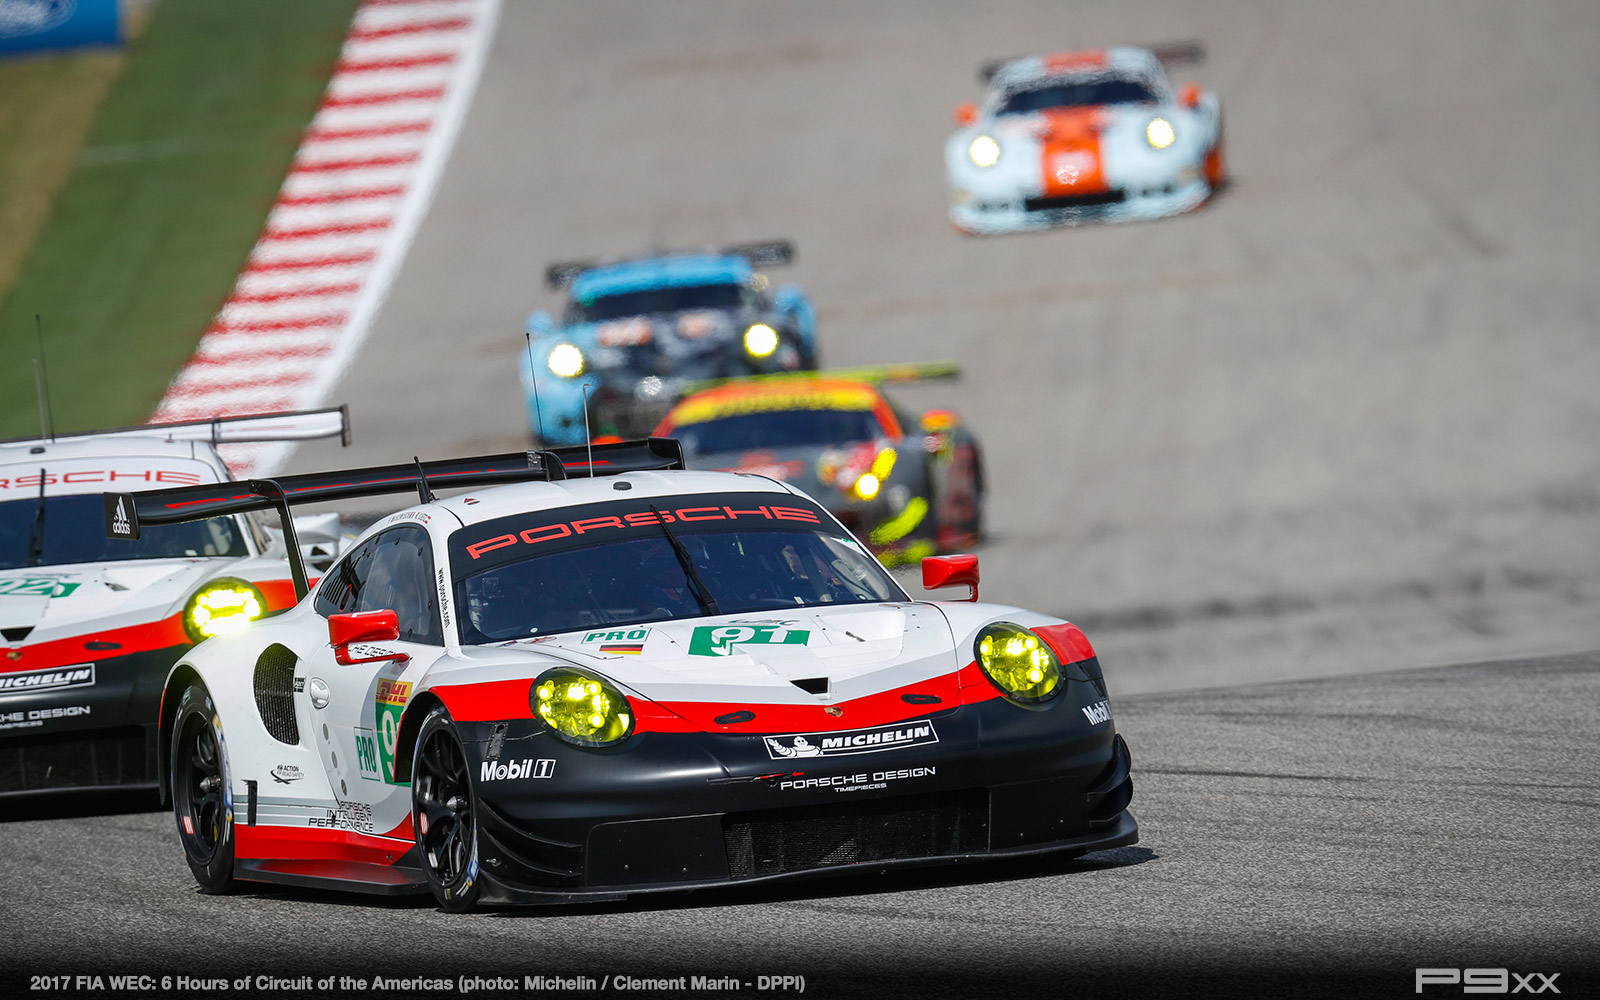 2017-FIA-WEC-6-HOURS-OF-COTA-PORSCHE-stin_02117009_12363300